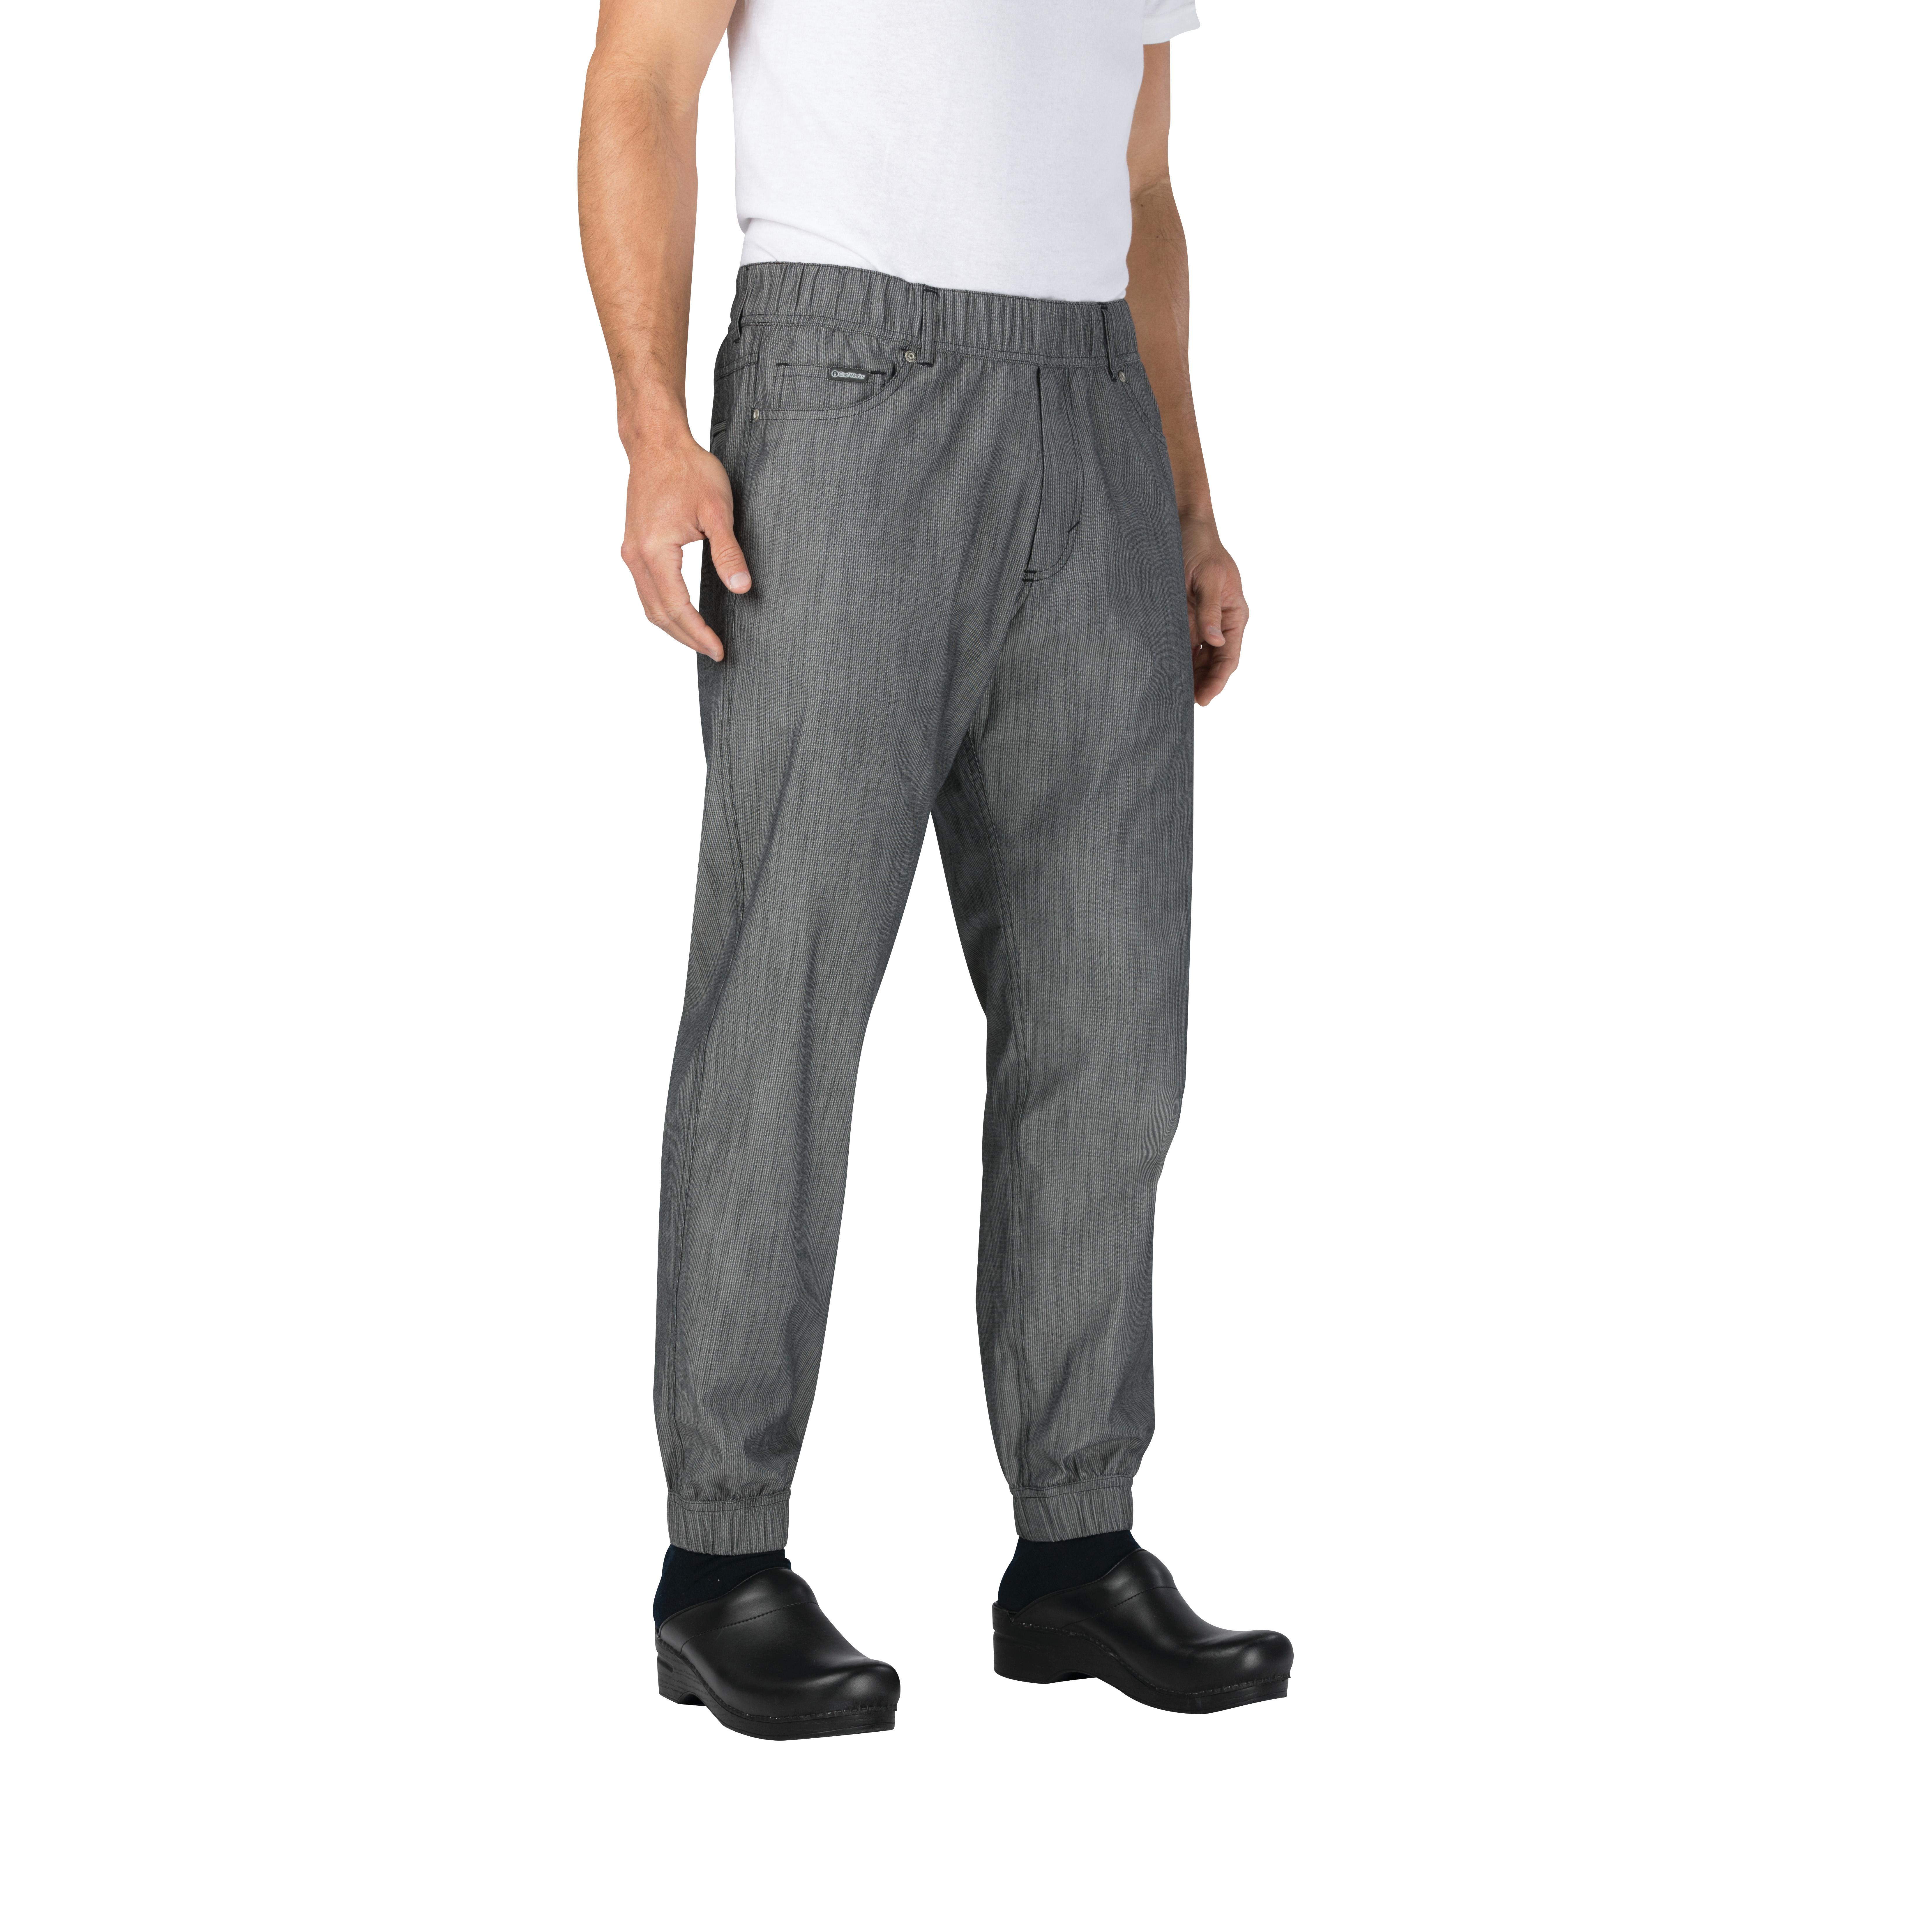 Chef Works PBE01BWSS chef's pants